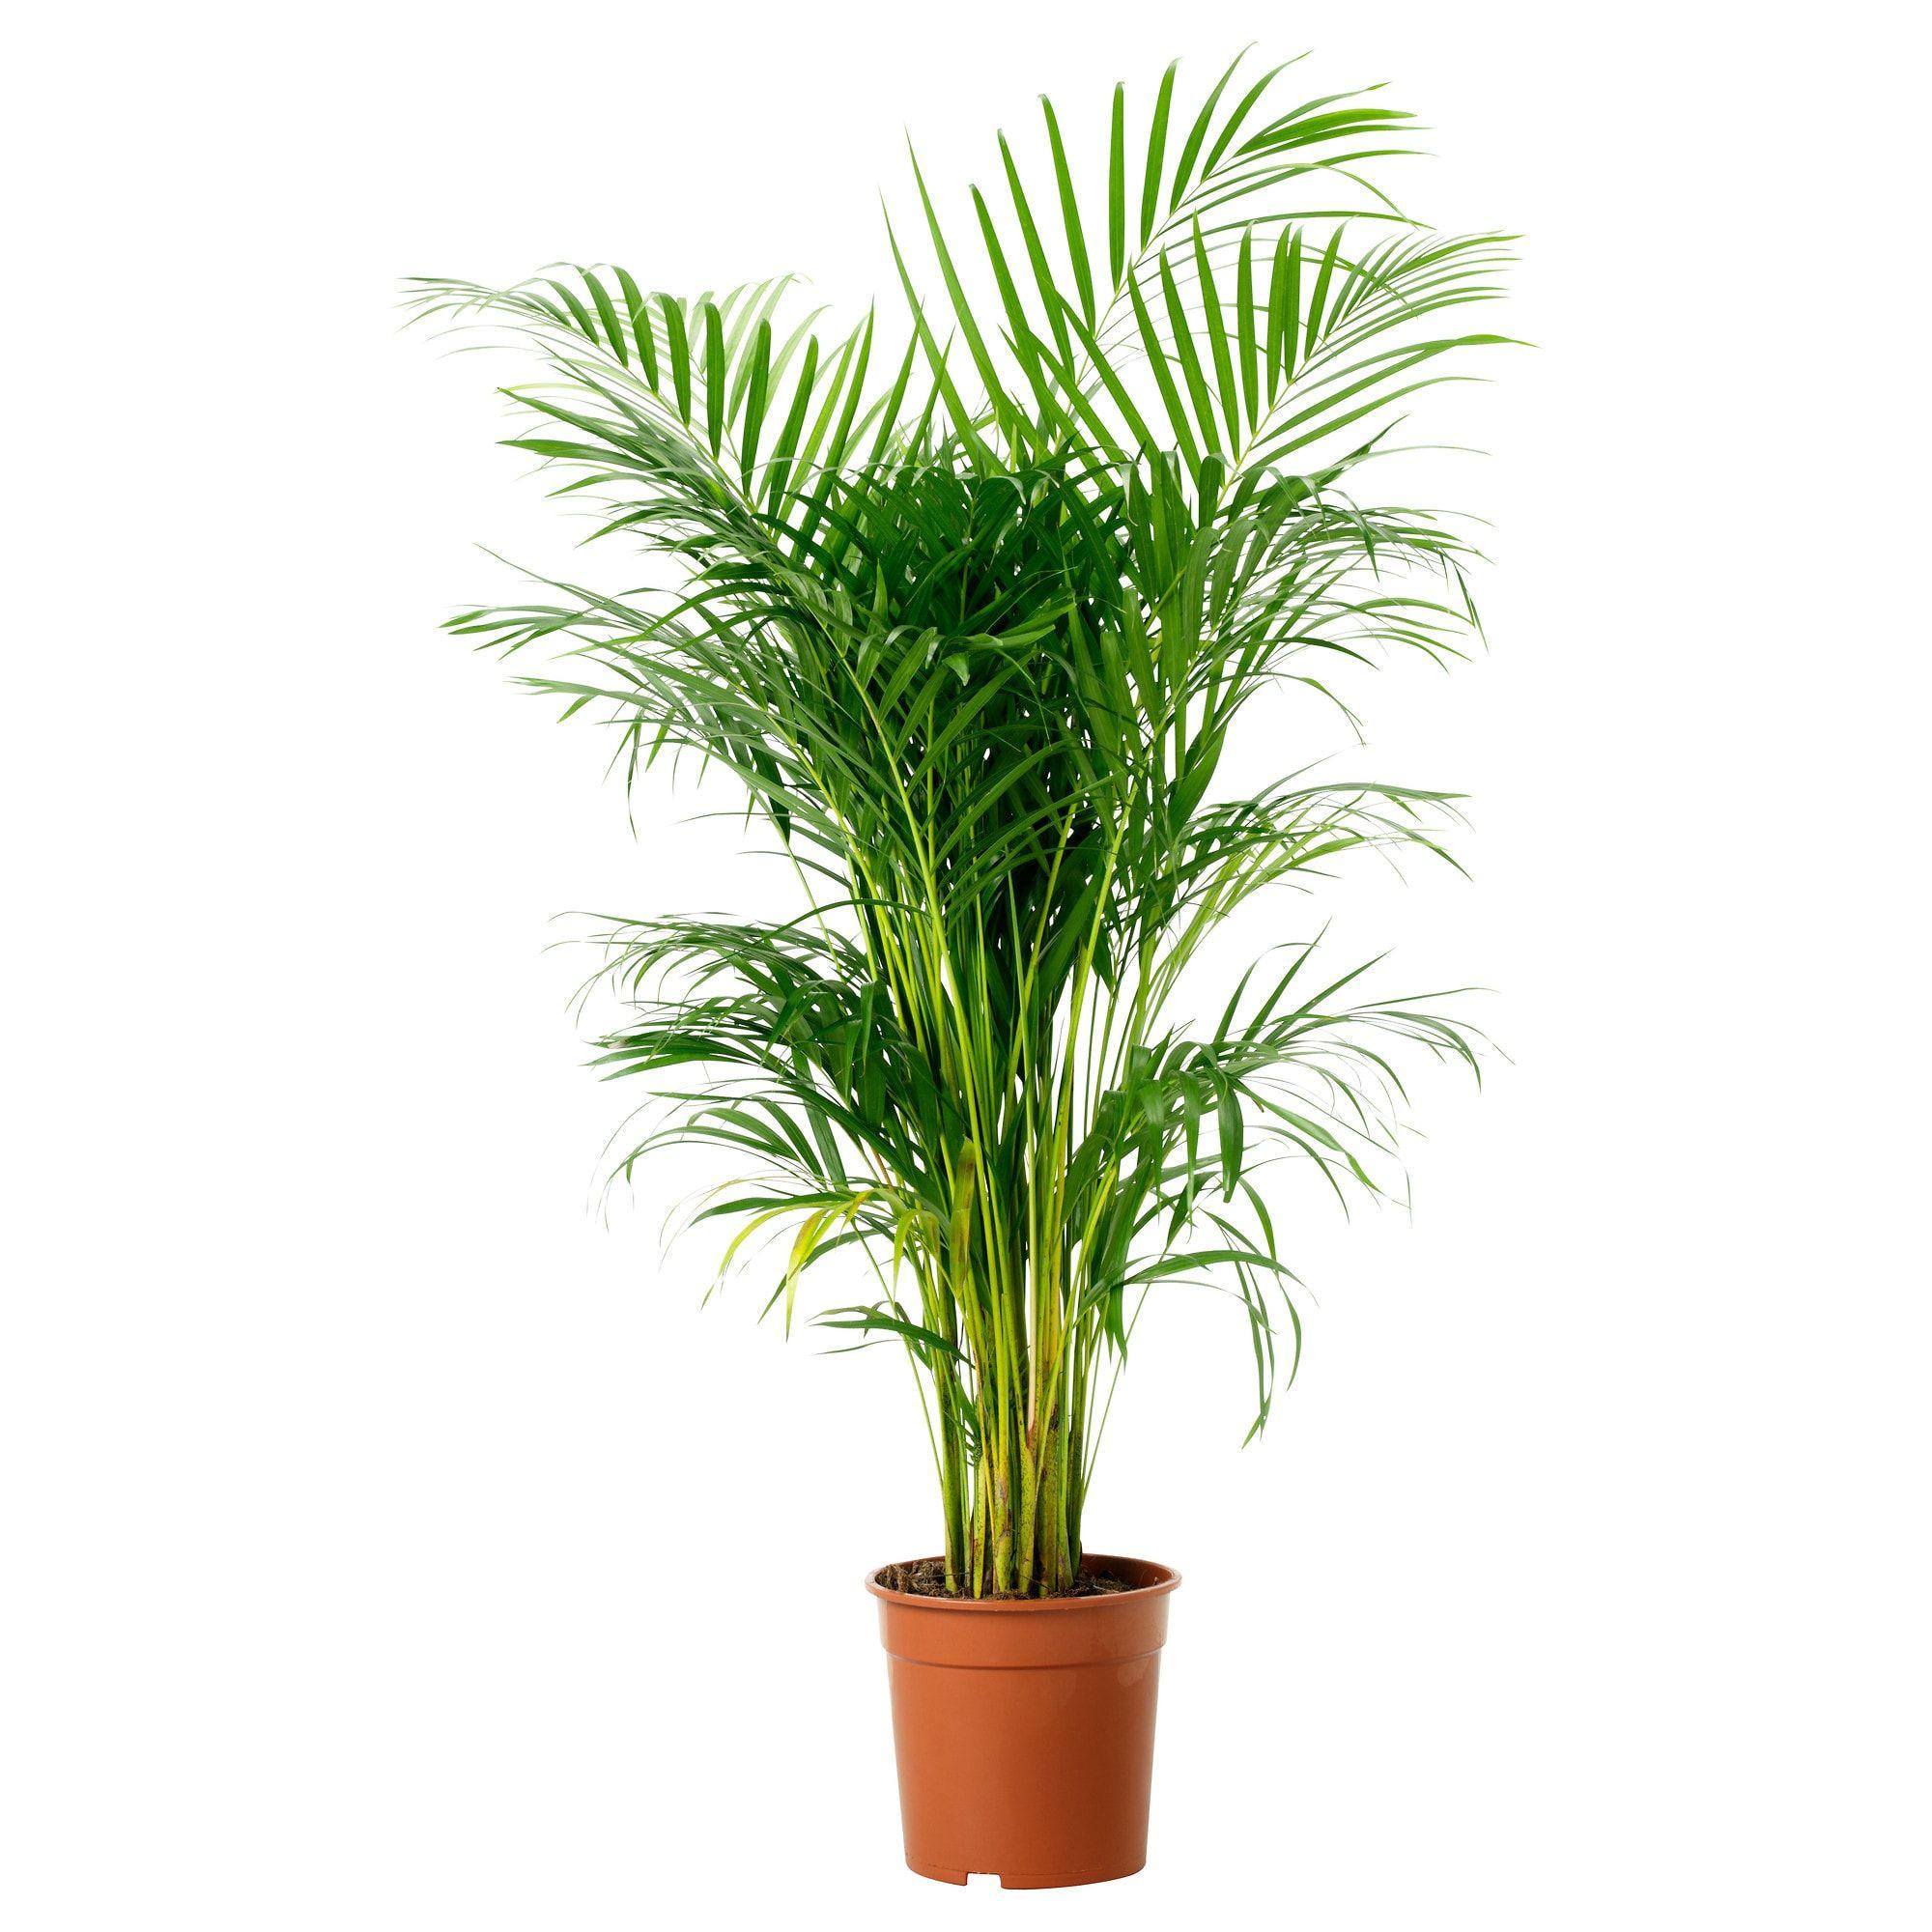 Dypsis Lutescens Potted Plant Areca Palm 24 Cm Palm 400 x 300